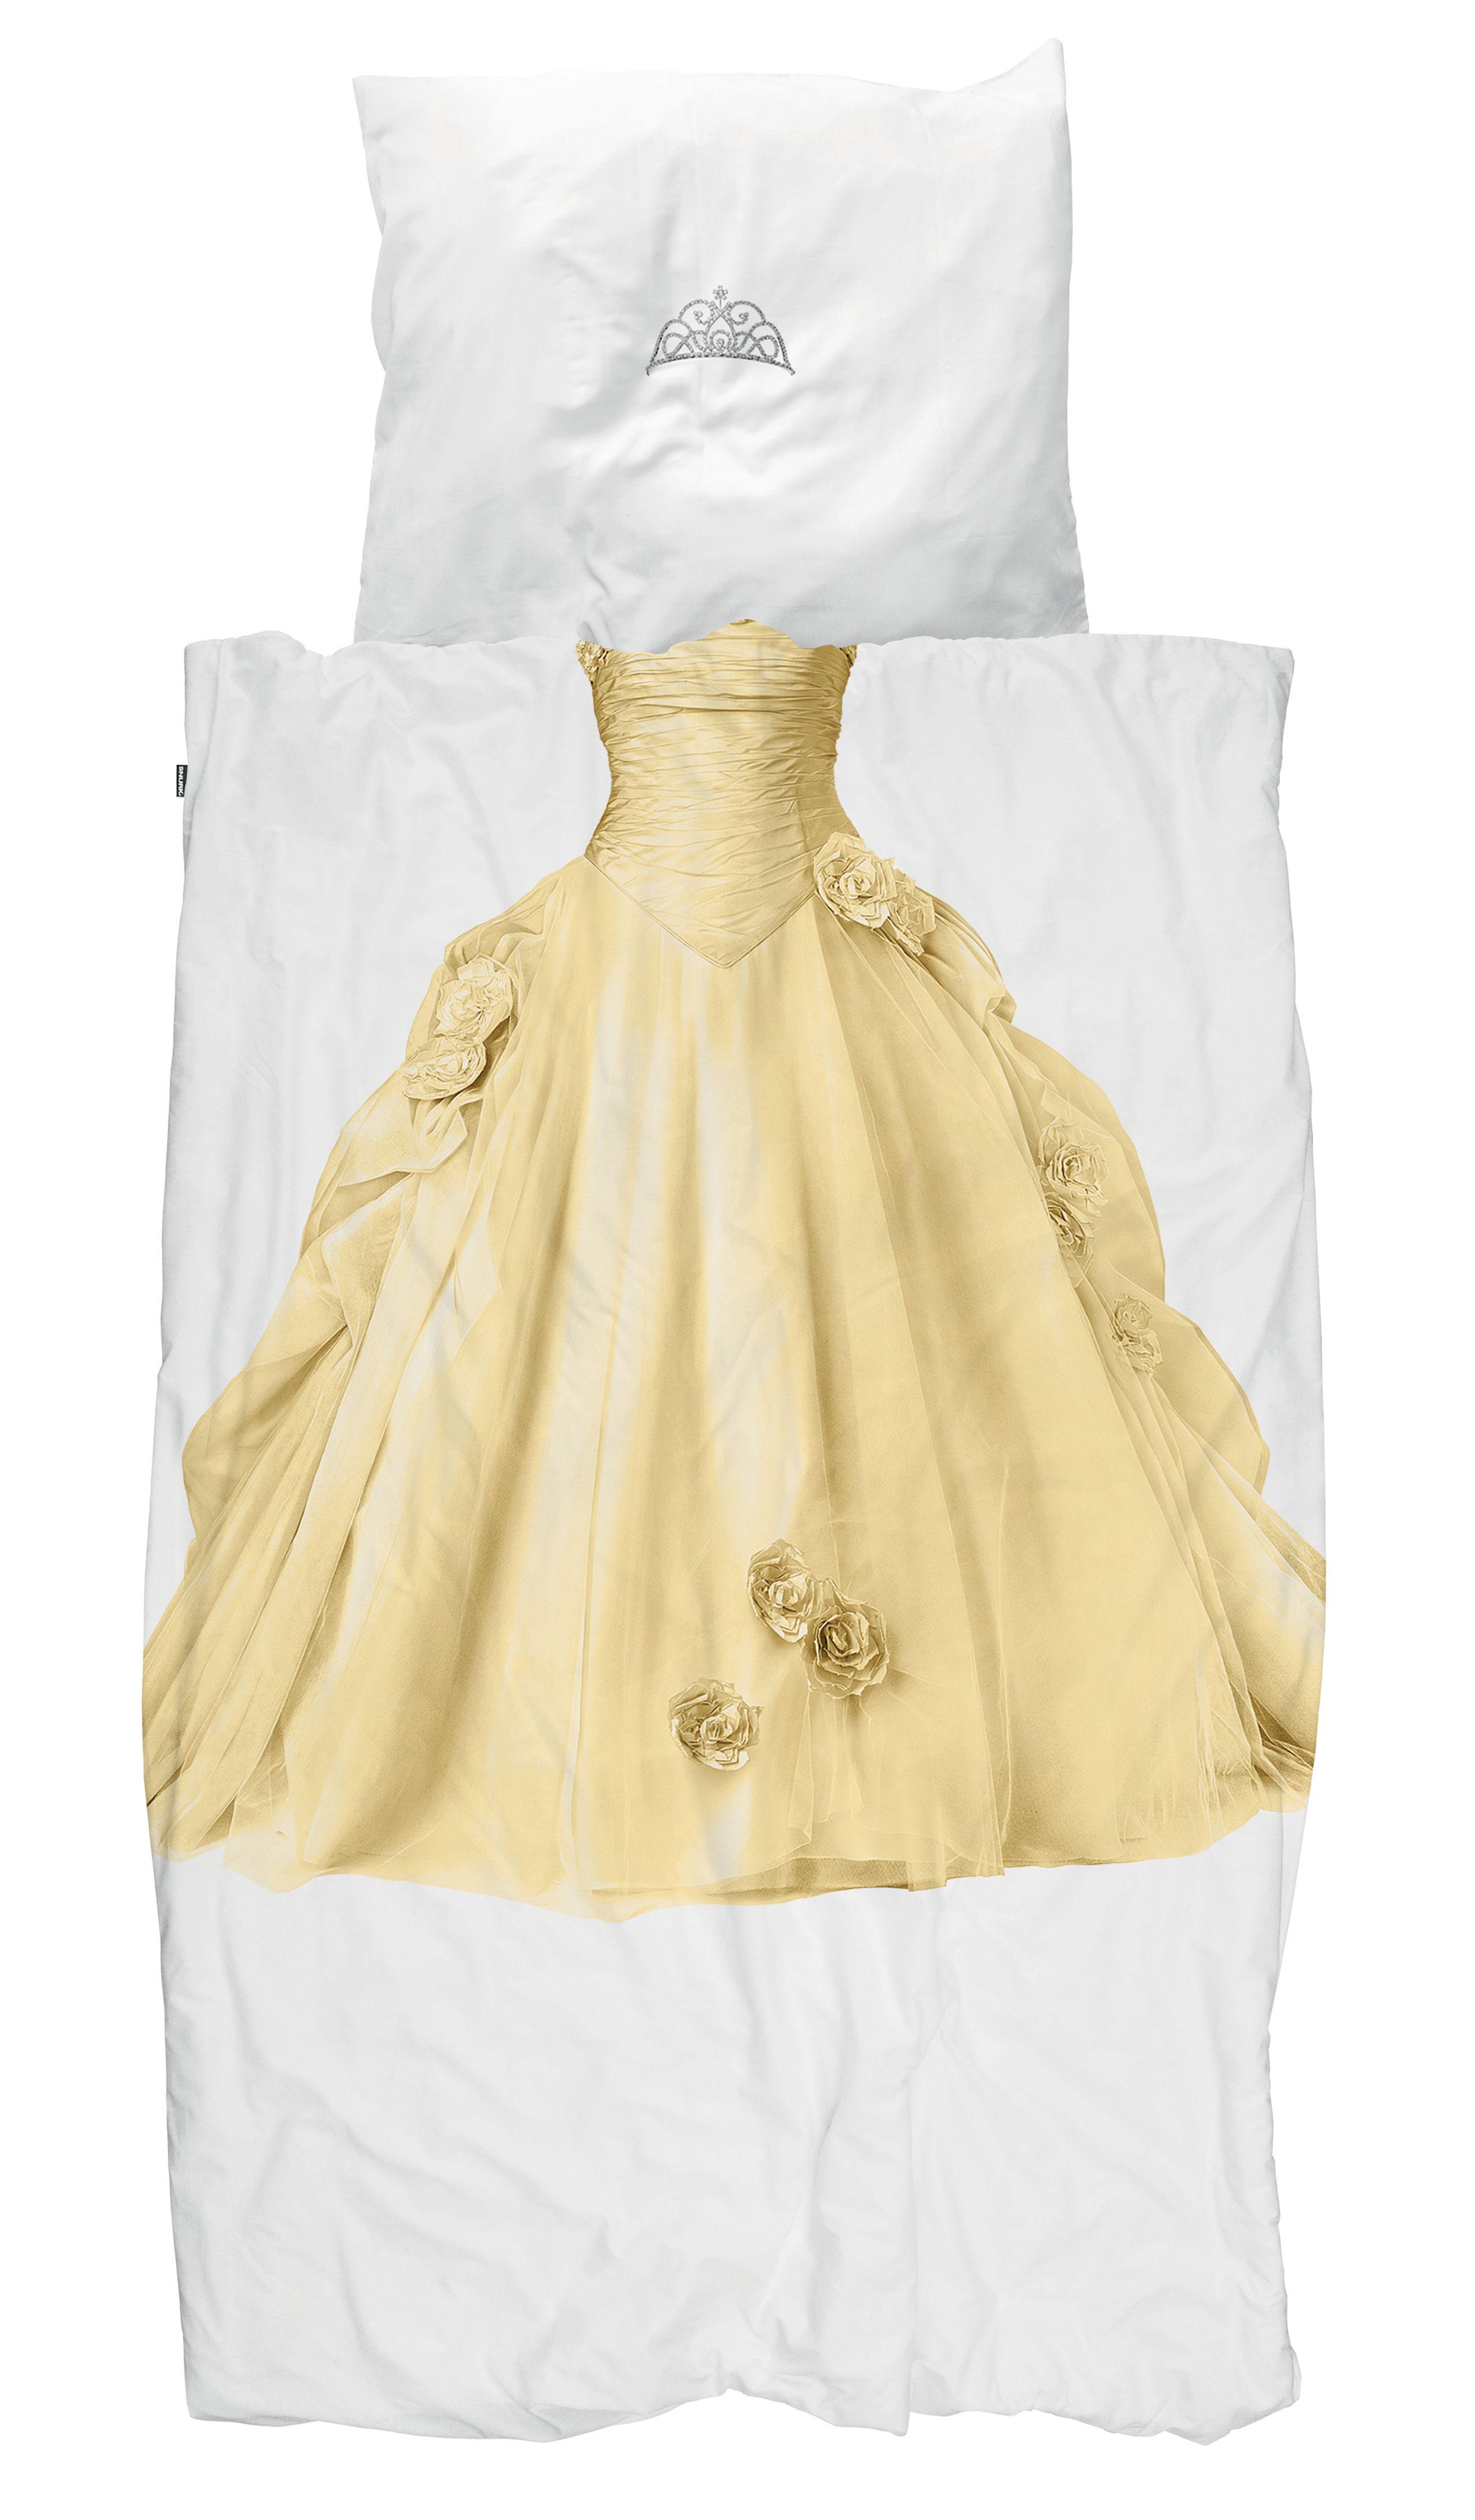 Decoration - Children's Home Accessories - Princesse Bedlinen set for 1 person - / 140 x 200 cm by Snurk - Princess / Yellow - Cotton